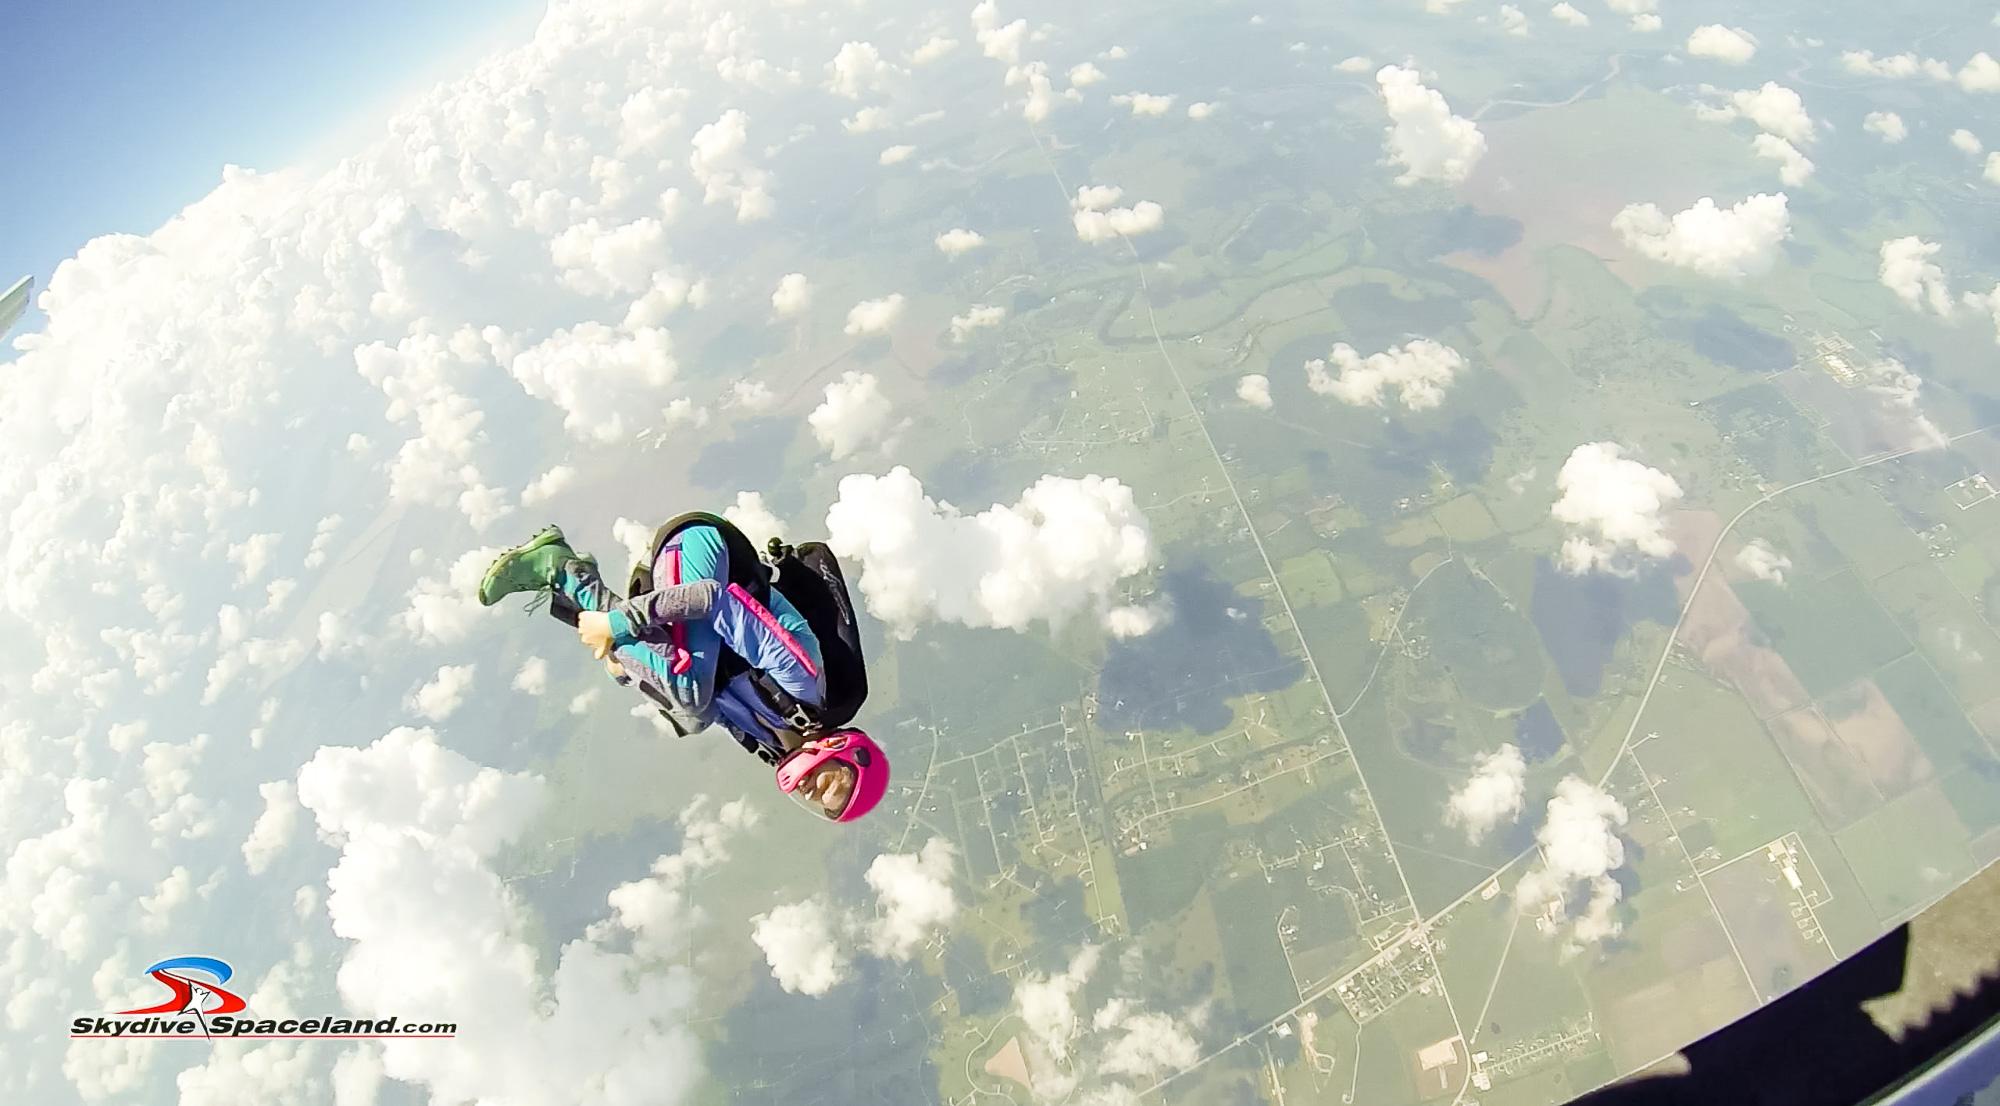 Skydiving Day-Video Screenshots-0017.jpg